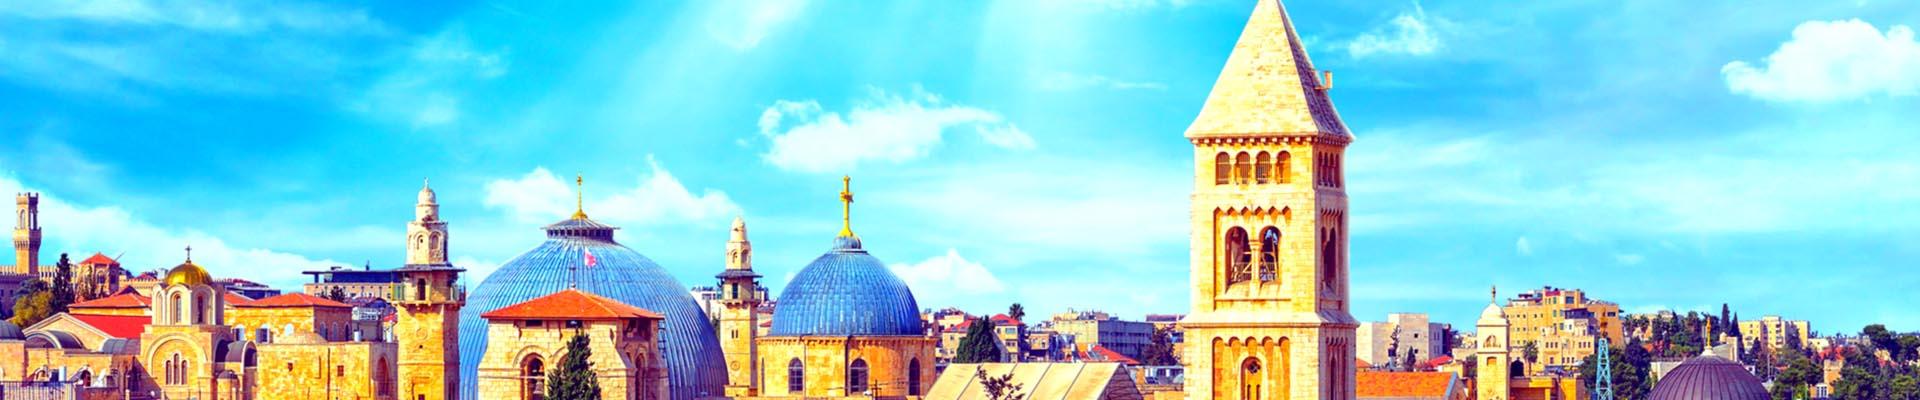 Catholic Holy Land Group Tour | Private 7 Day Pilgrimage ...